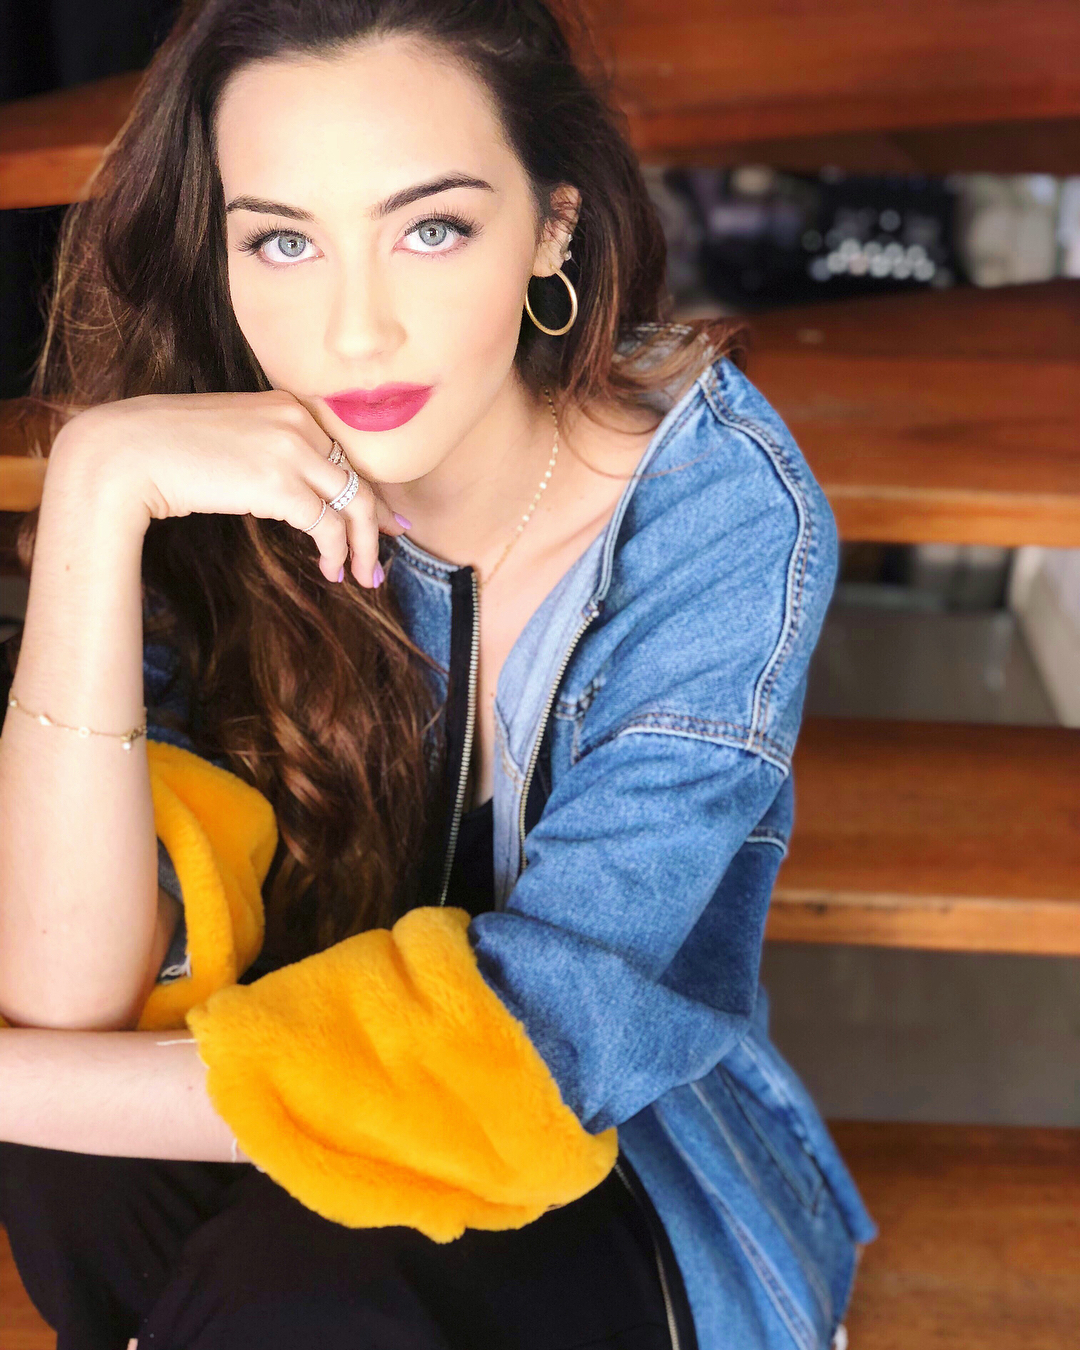 candidatas a miss world australia 2018. final: 31 agosto. - Página 4 Jep99gls